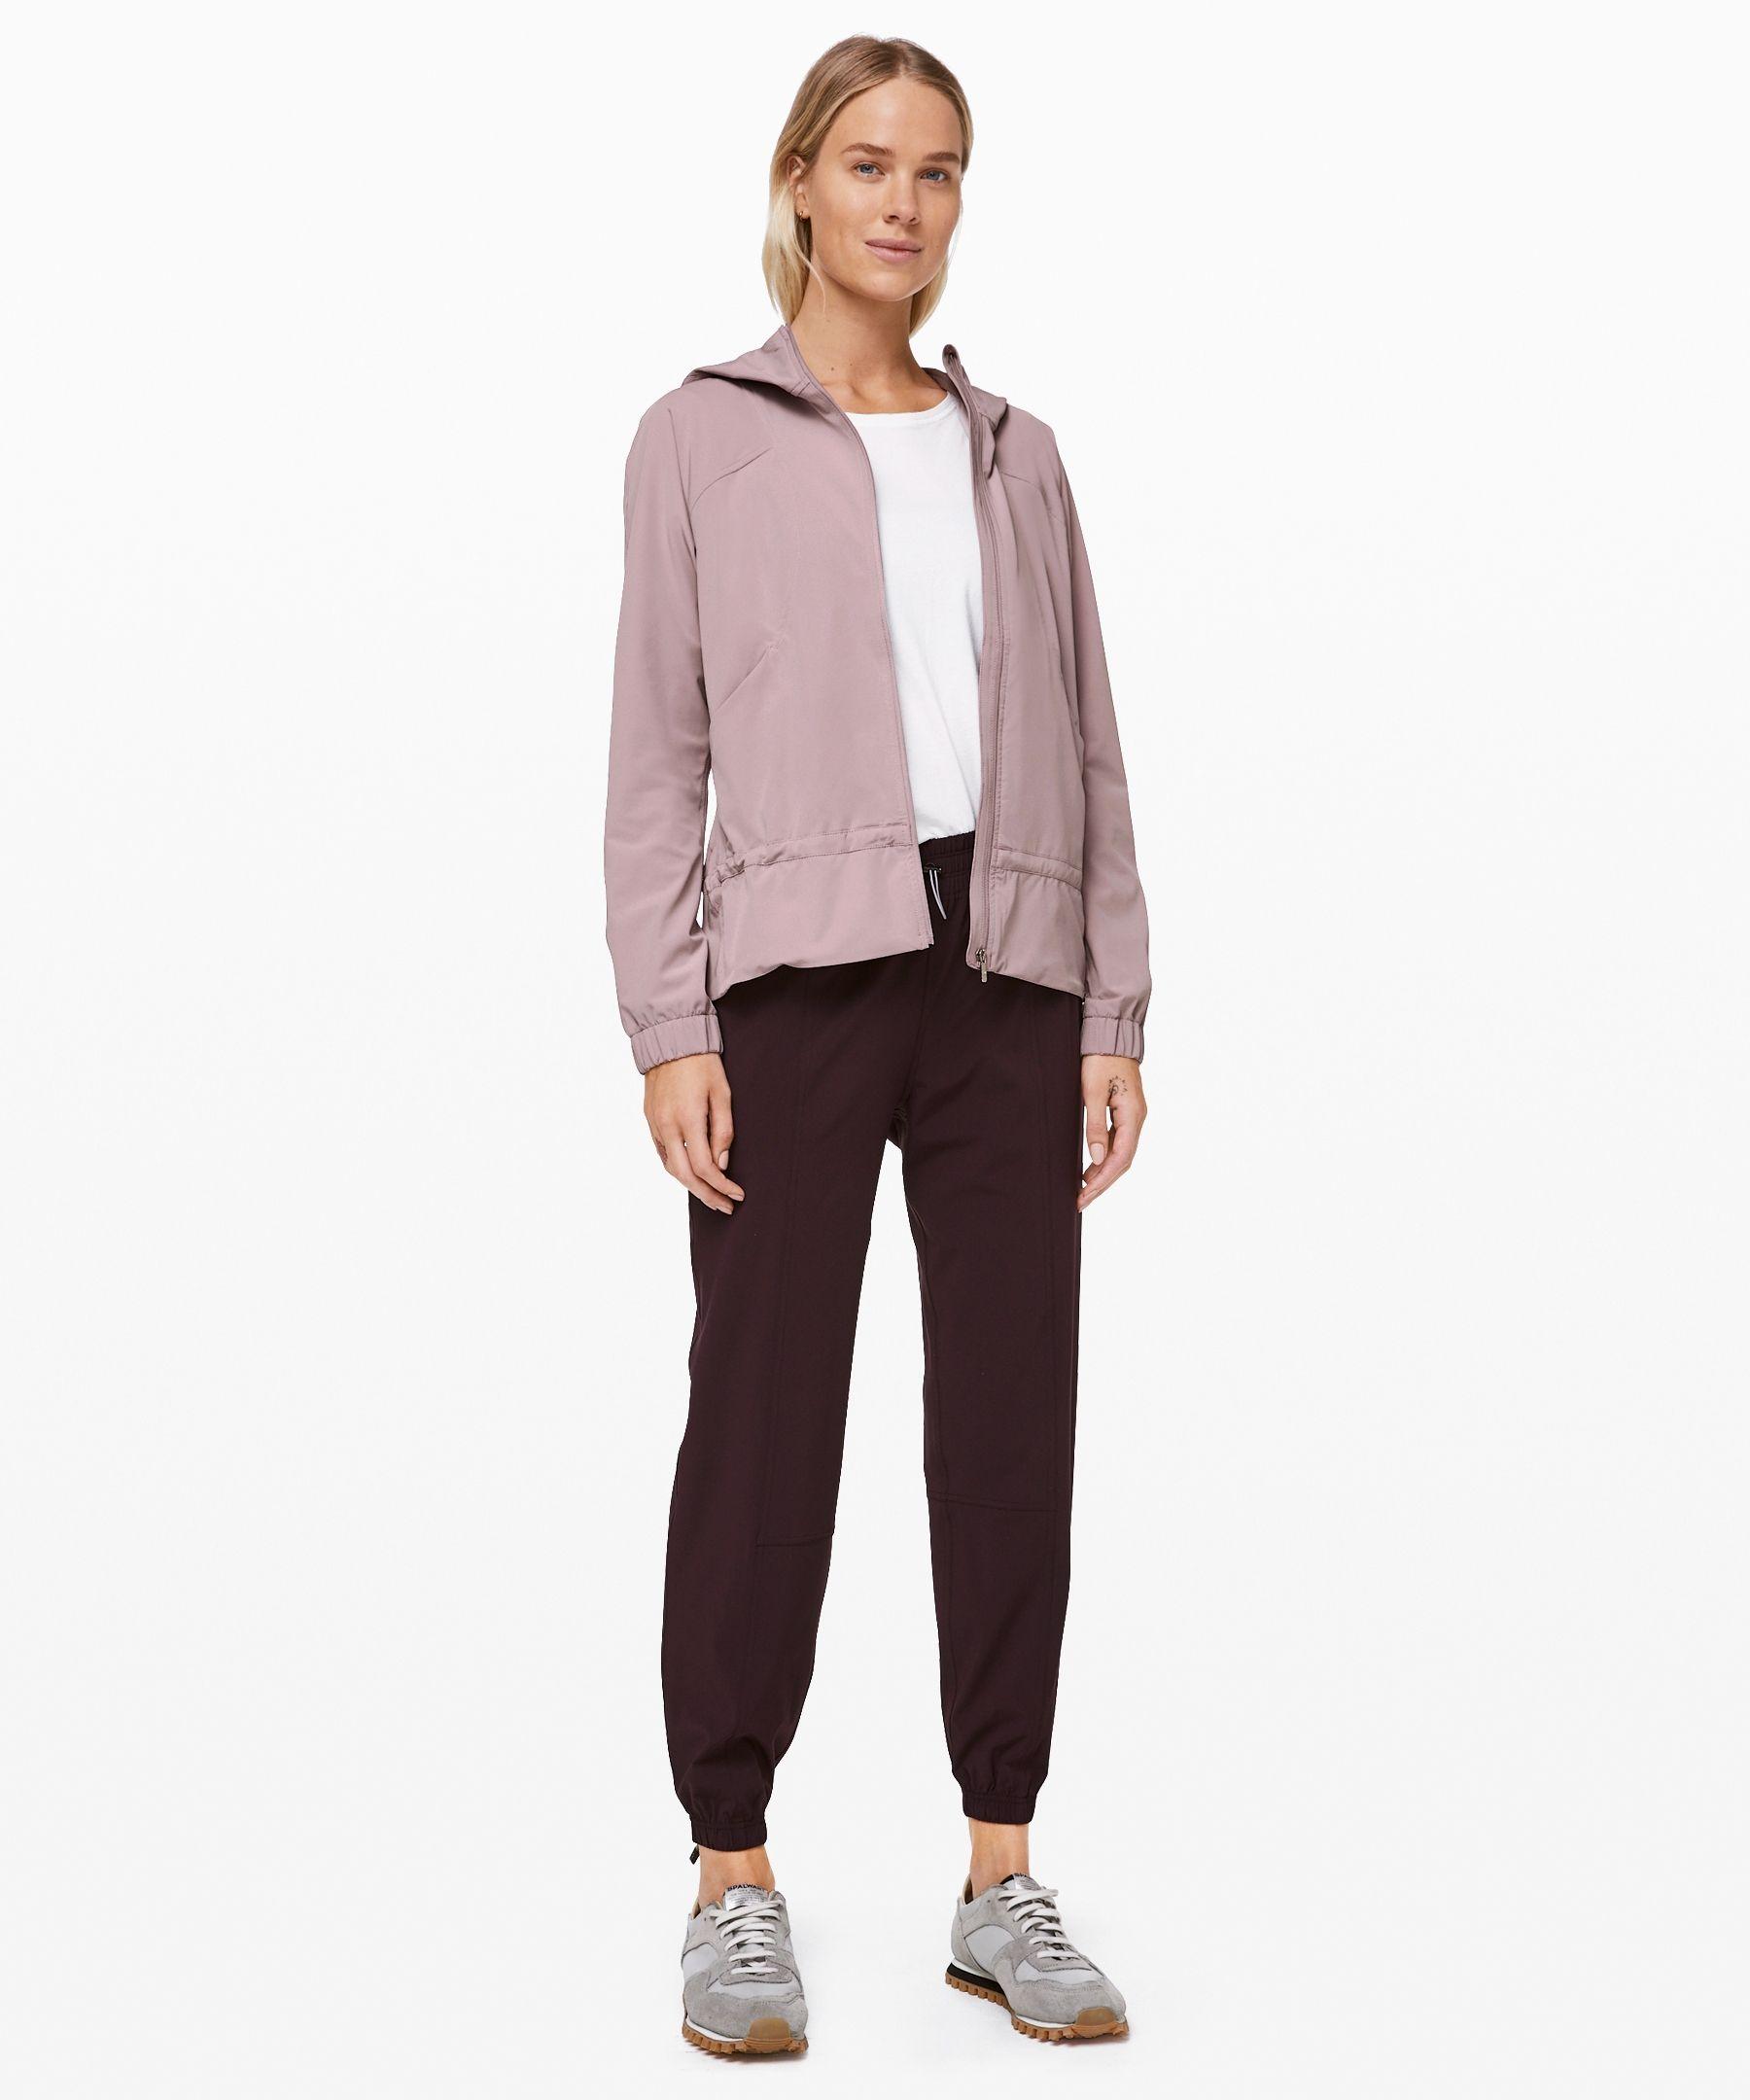 Lululemon Women S Pack It Up Jacket Smoky Blush Size 2 Jackets For Women Outerwear Jackets Outerwear [ 2160 x 1800 Pixel ]